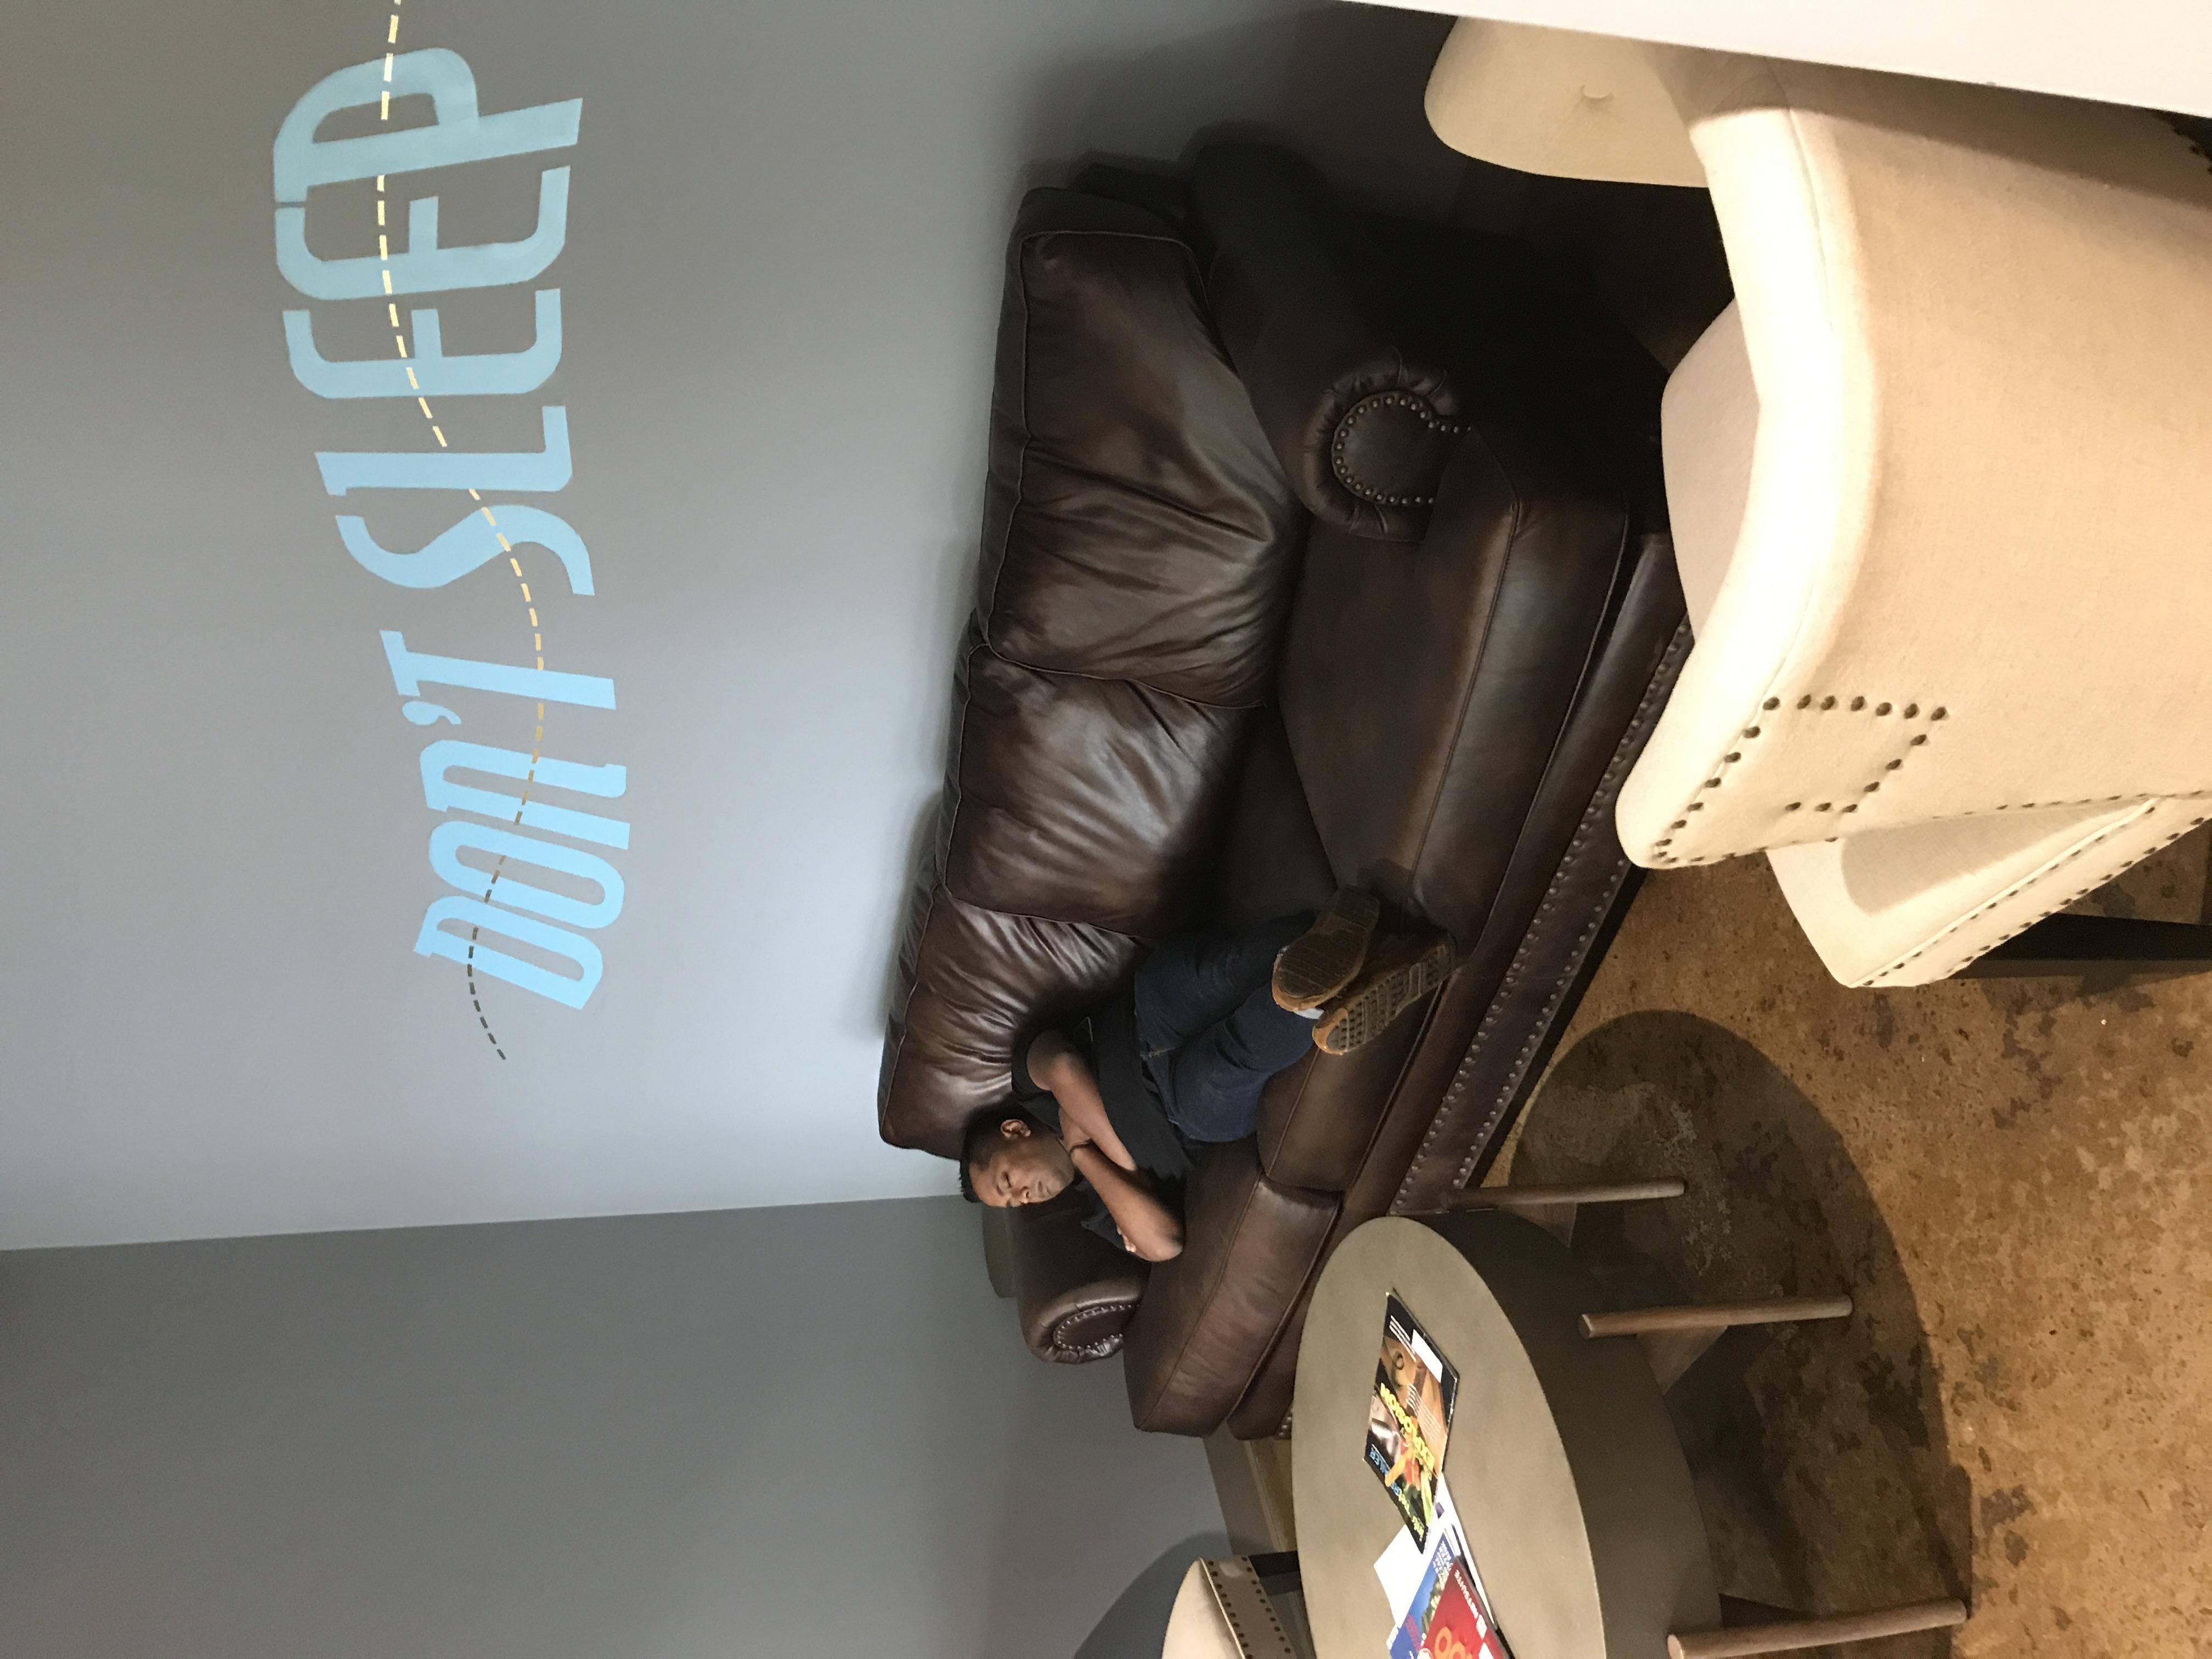 GlobeHub-Chamblee-Coworking-Sleeping